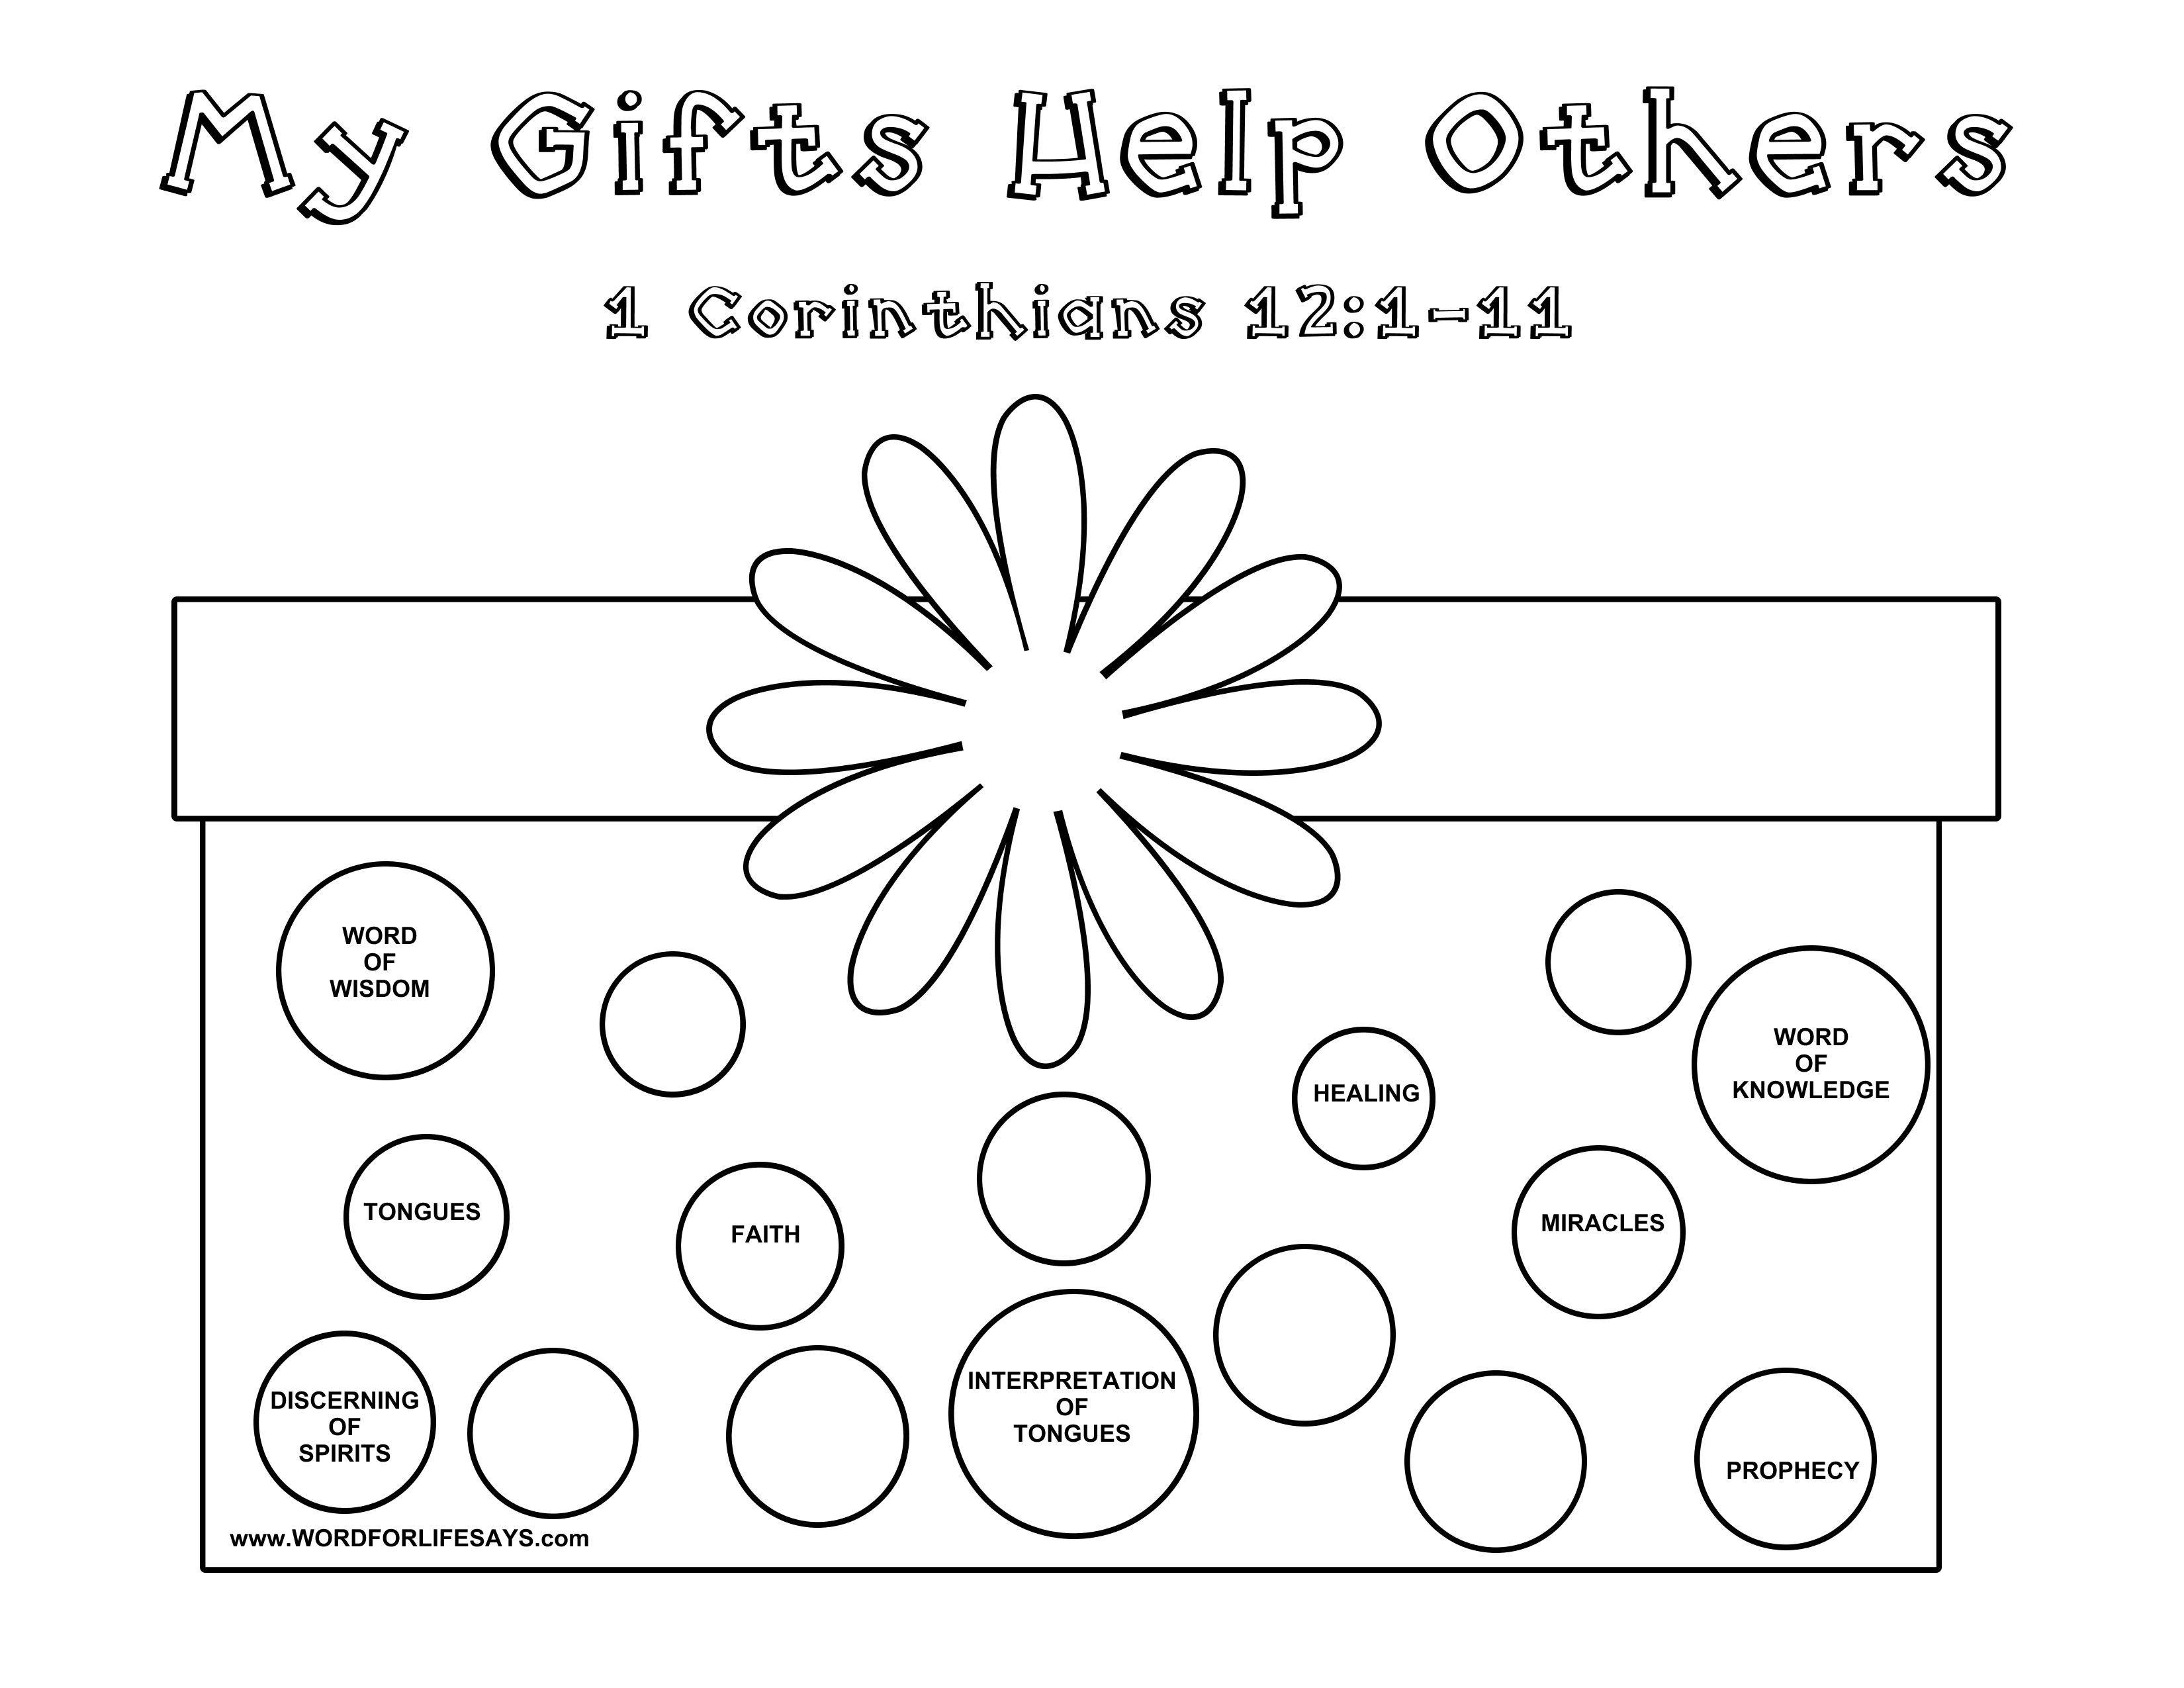 Ts Of The Spirit Sunday Lesson 1 Corinthians 12 11